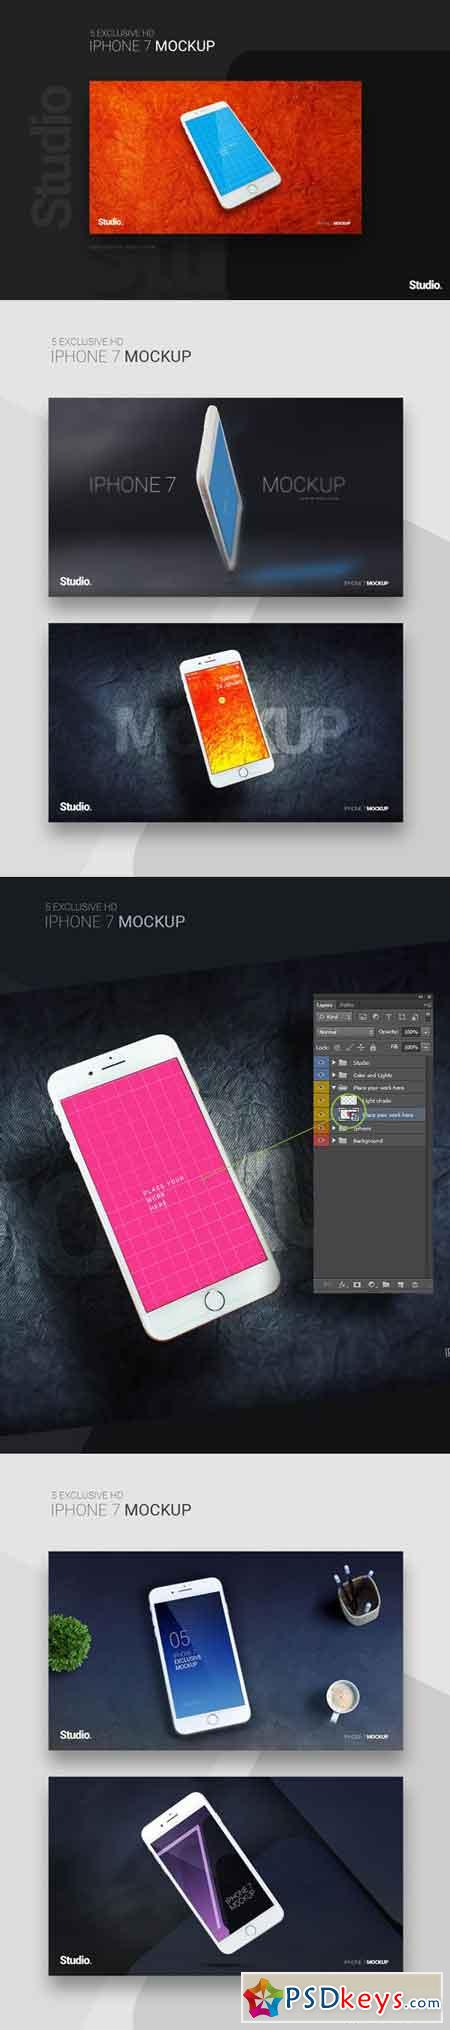 Iphone 7 Mockup - 5 Exclusive Screens